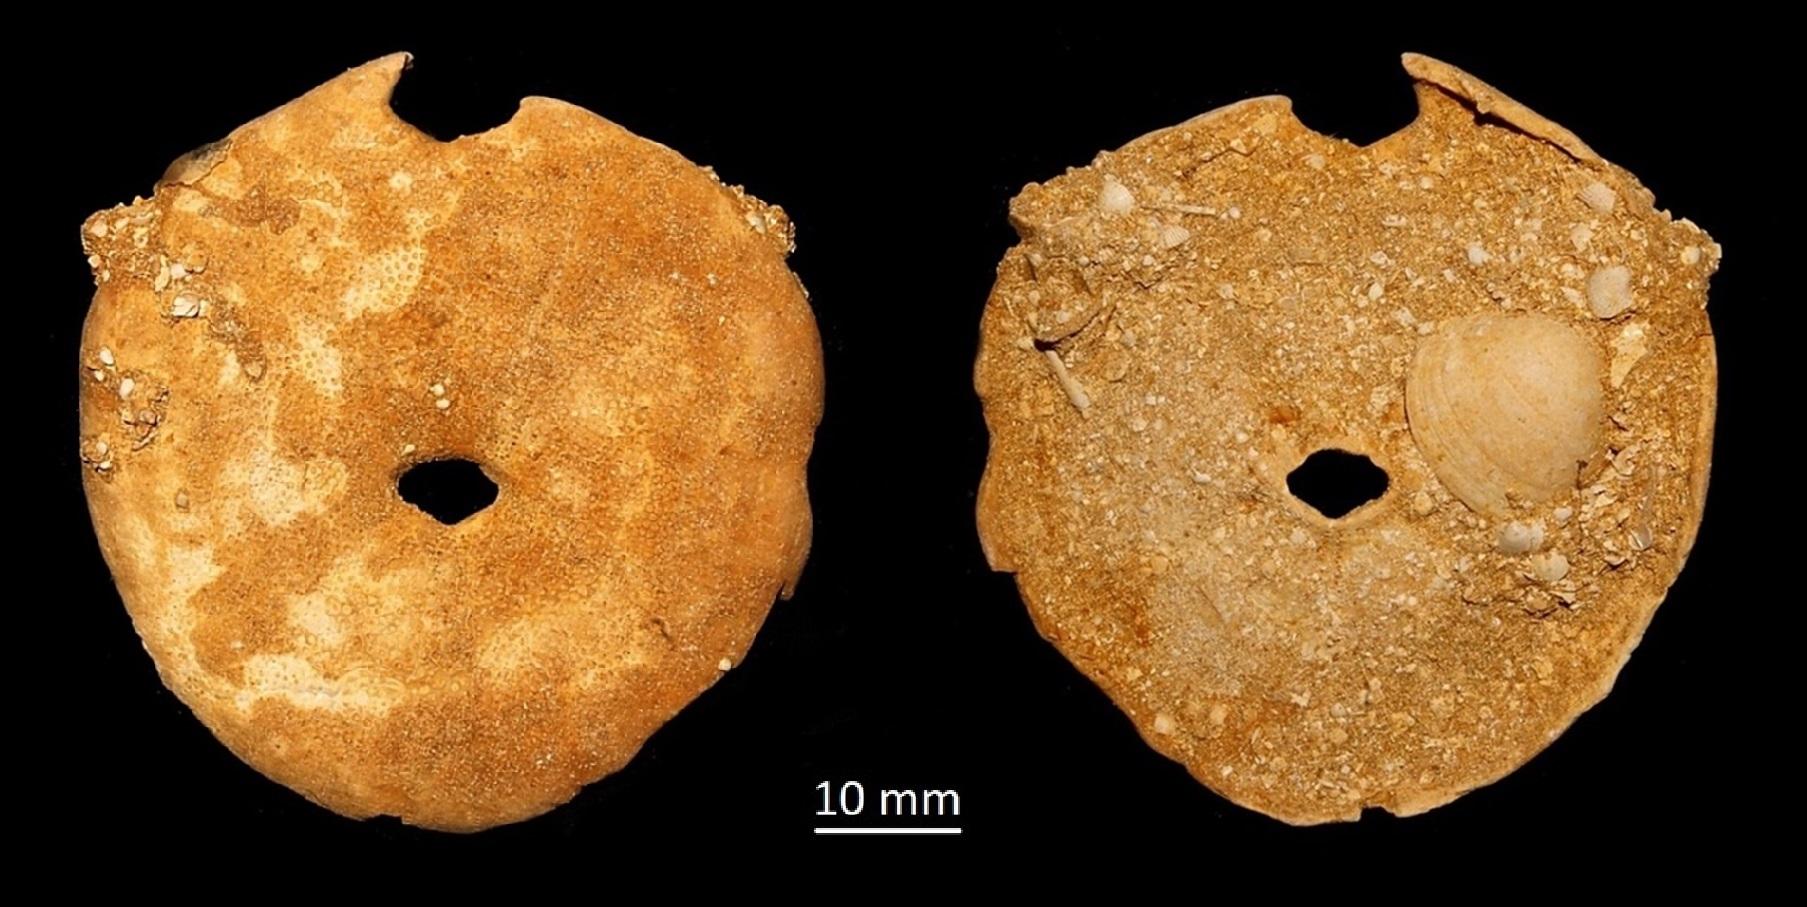 Echinolampas richardii, Miocene dell'Aquitania